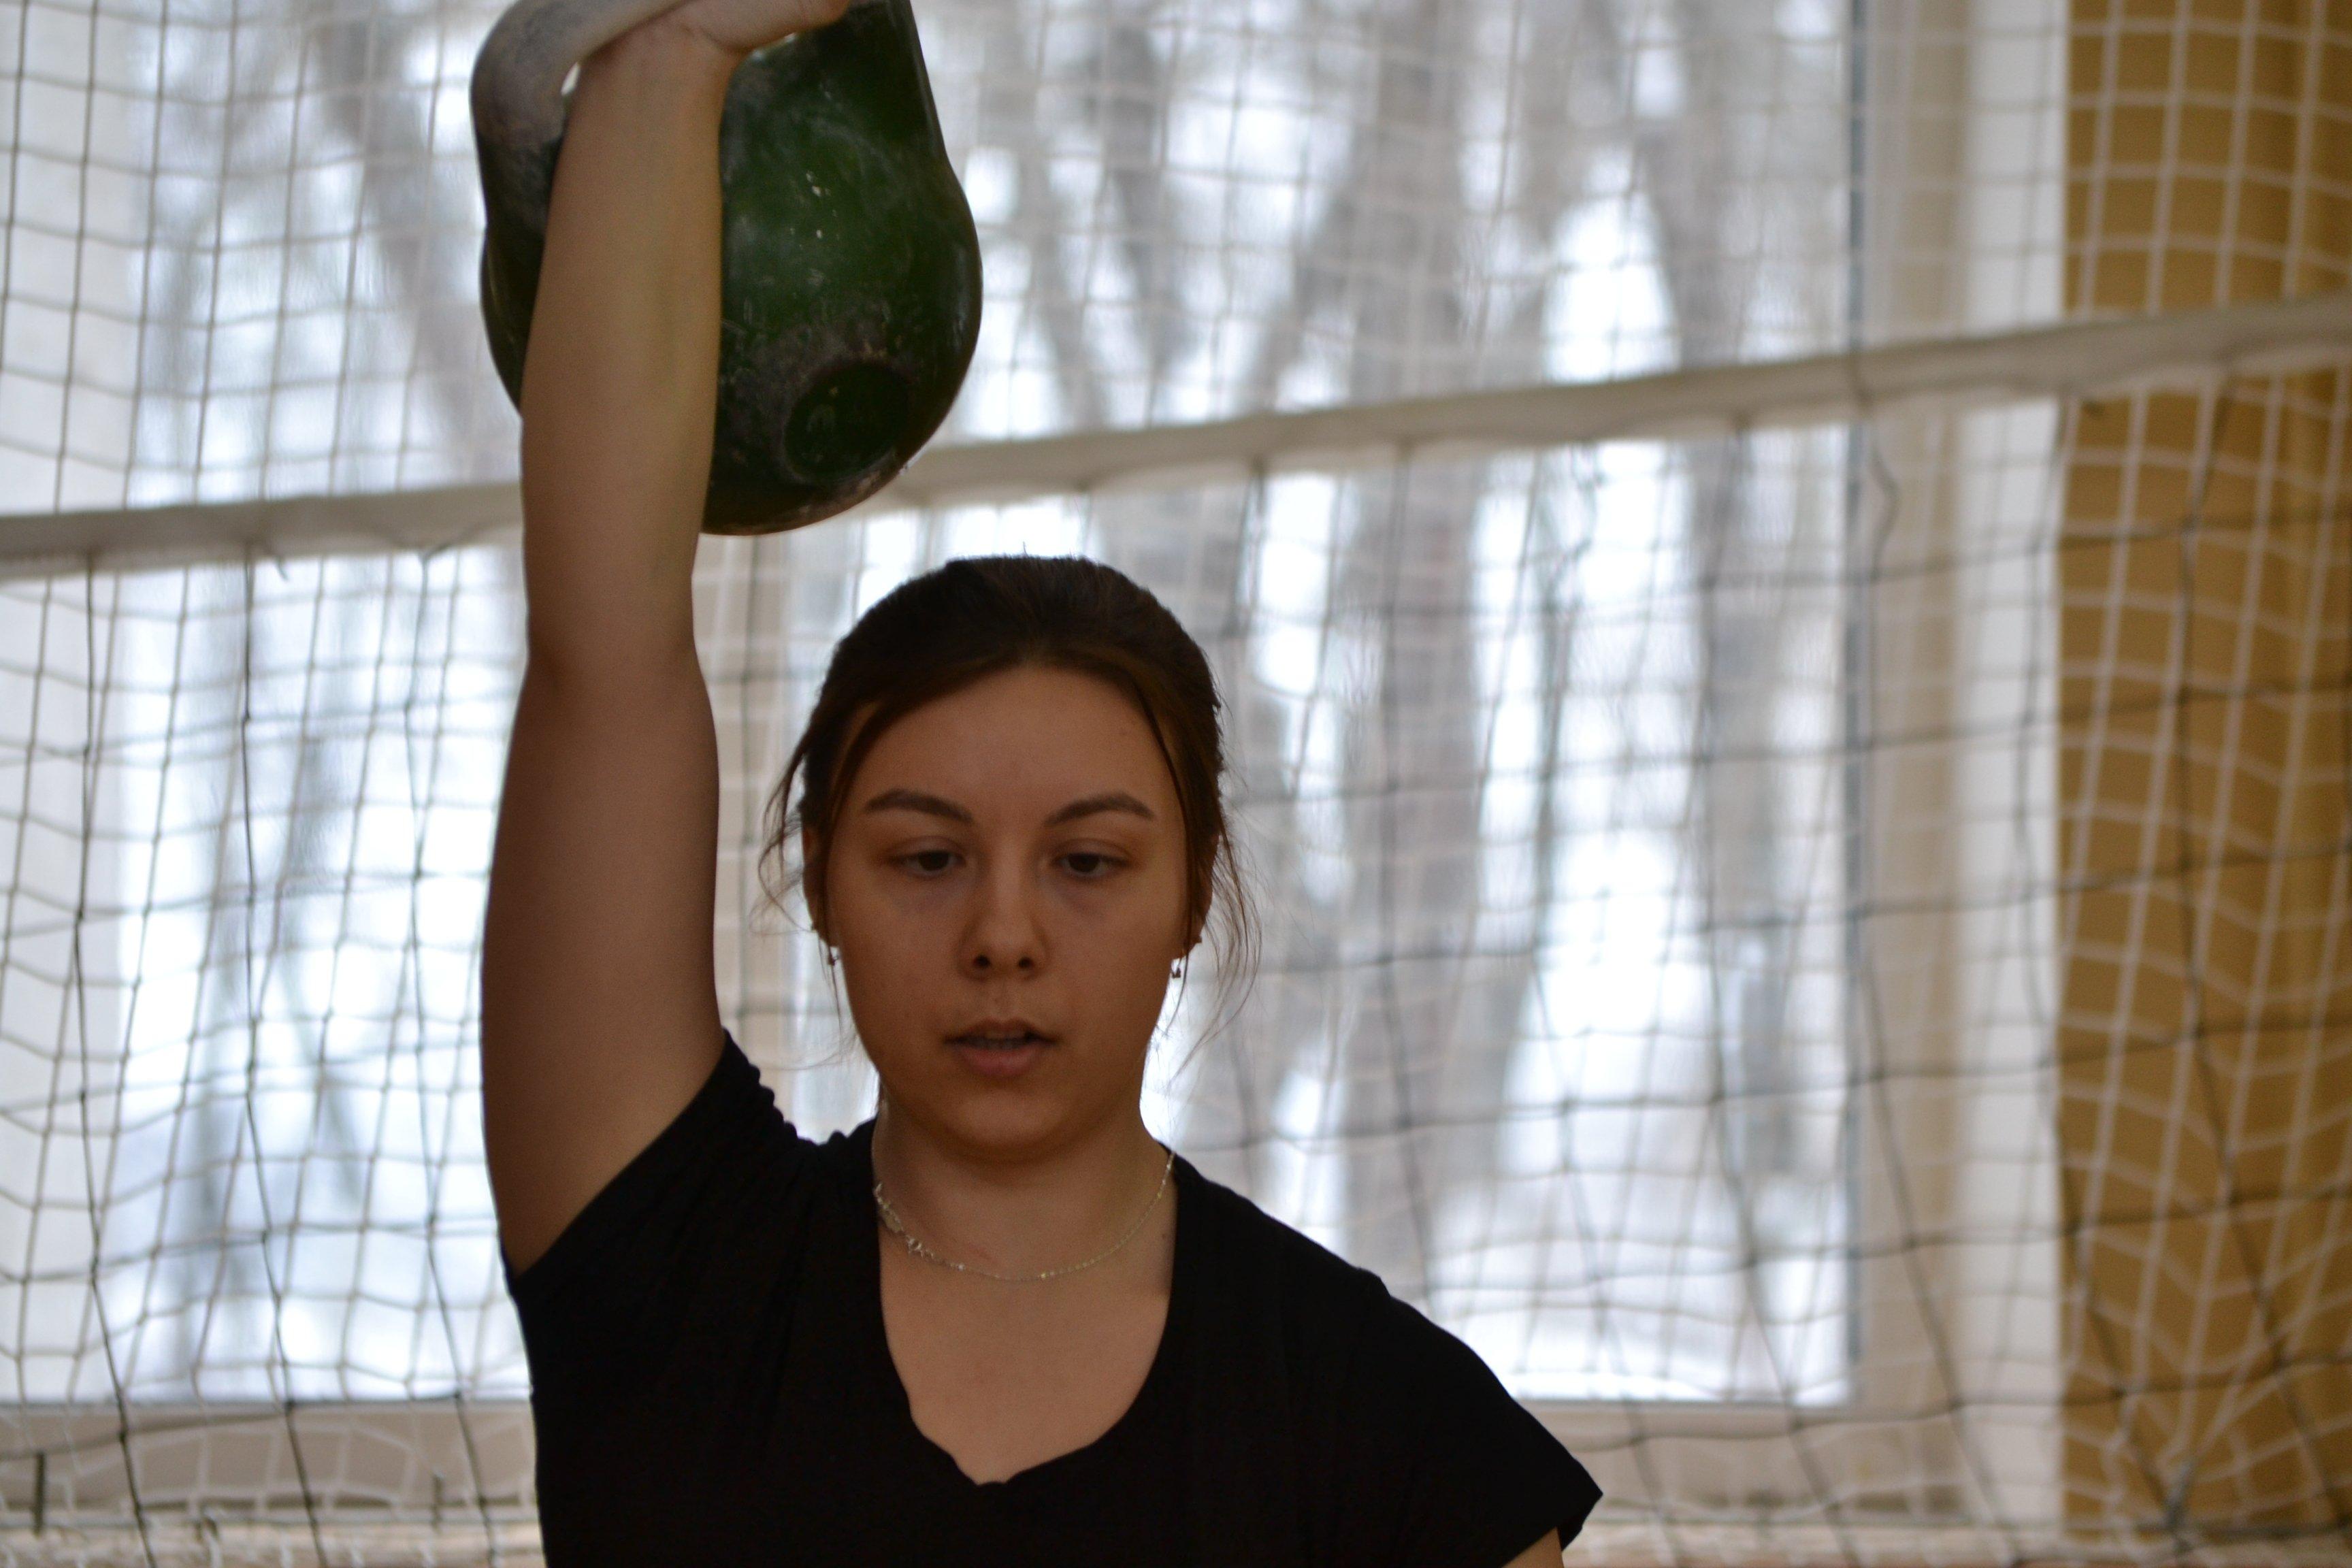 Вологжанка завоевала серебро Кубка России по гиревому спорту